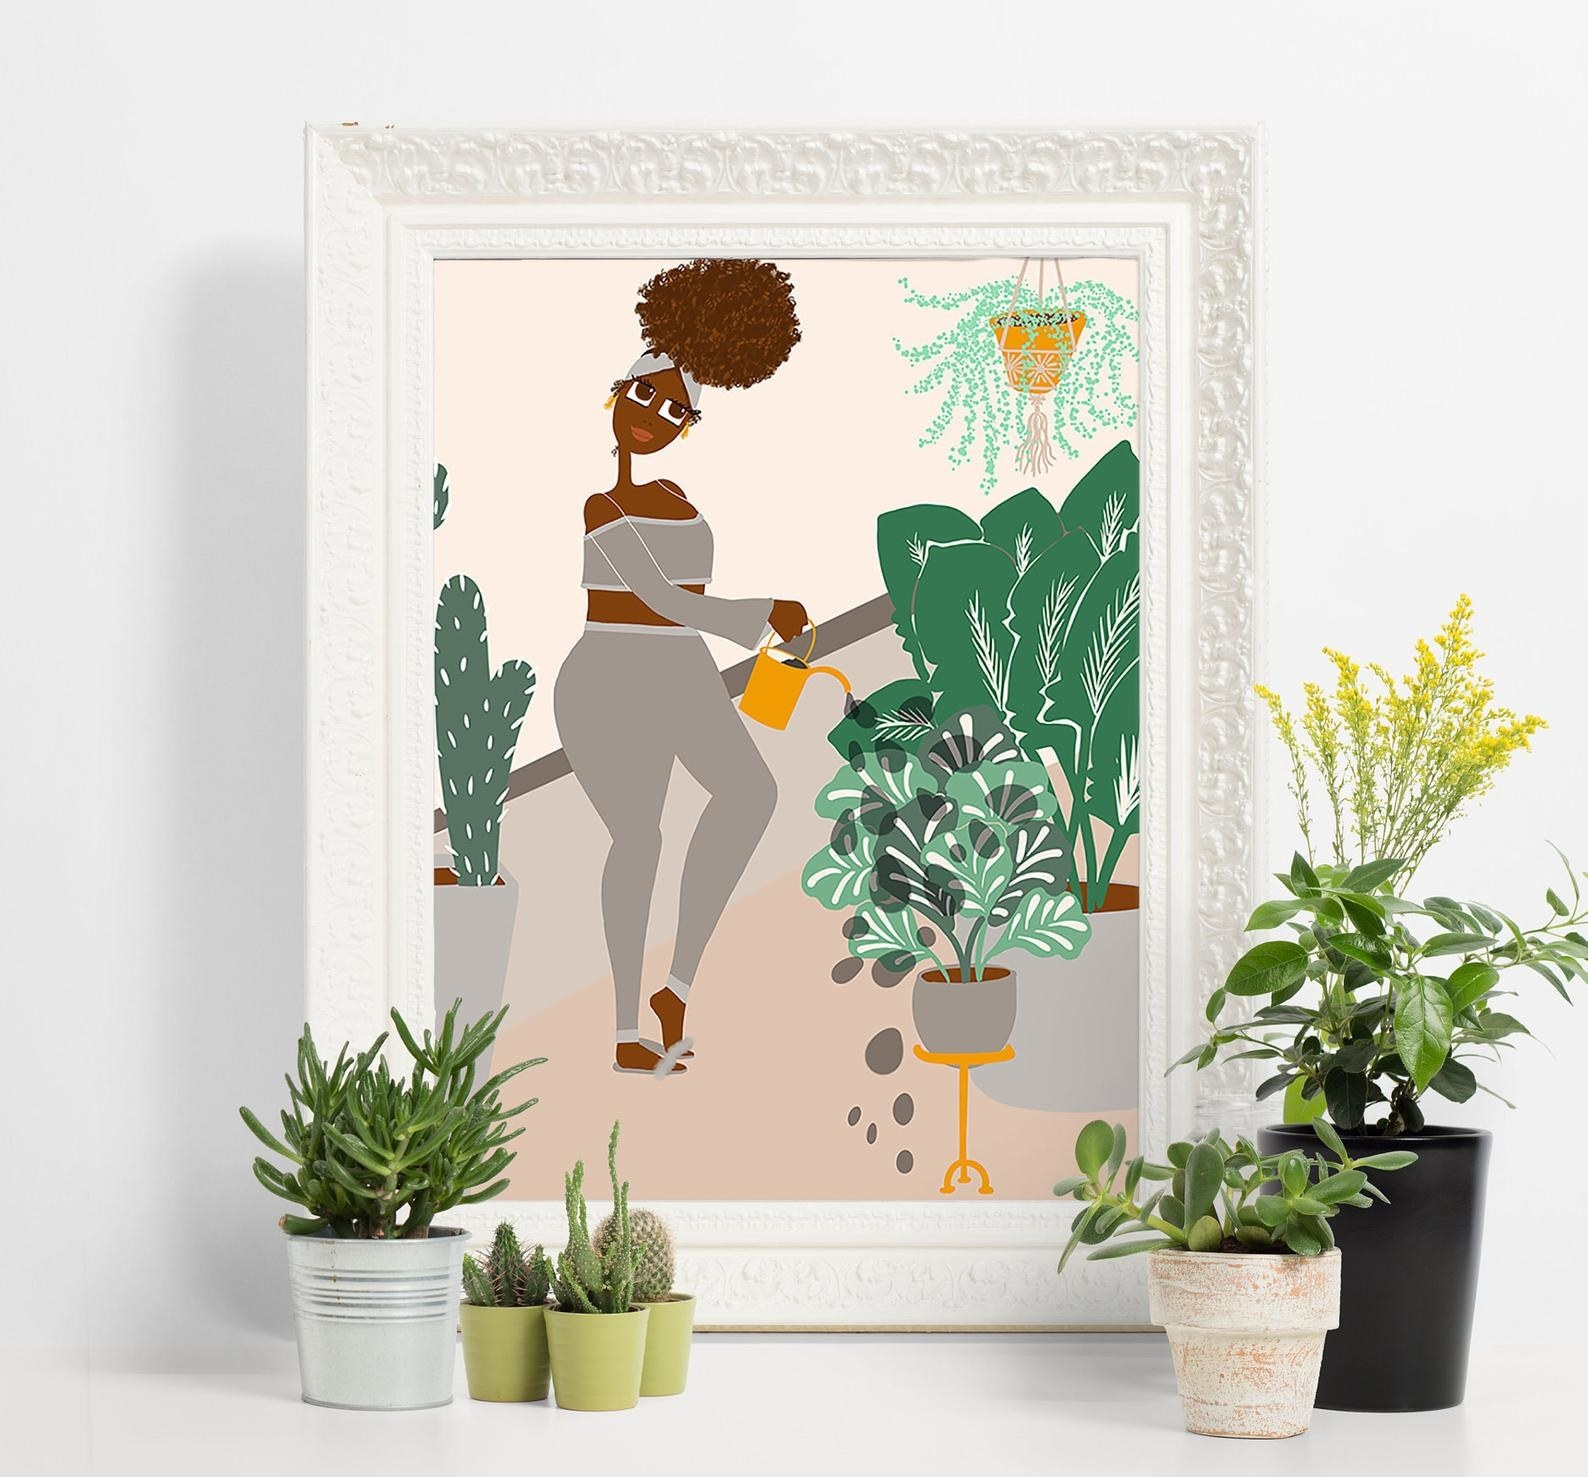 illustration of Black woman watering plants